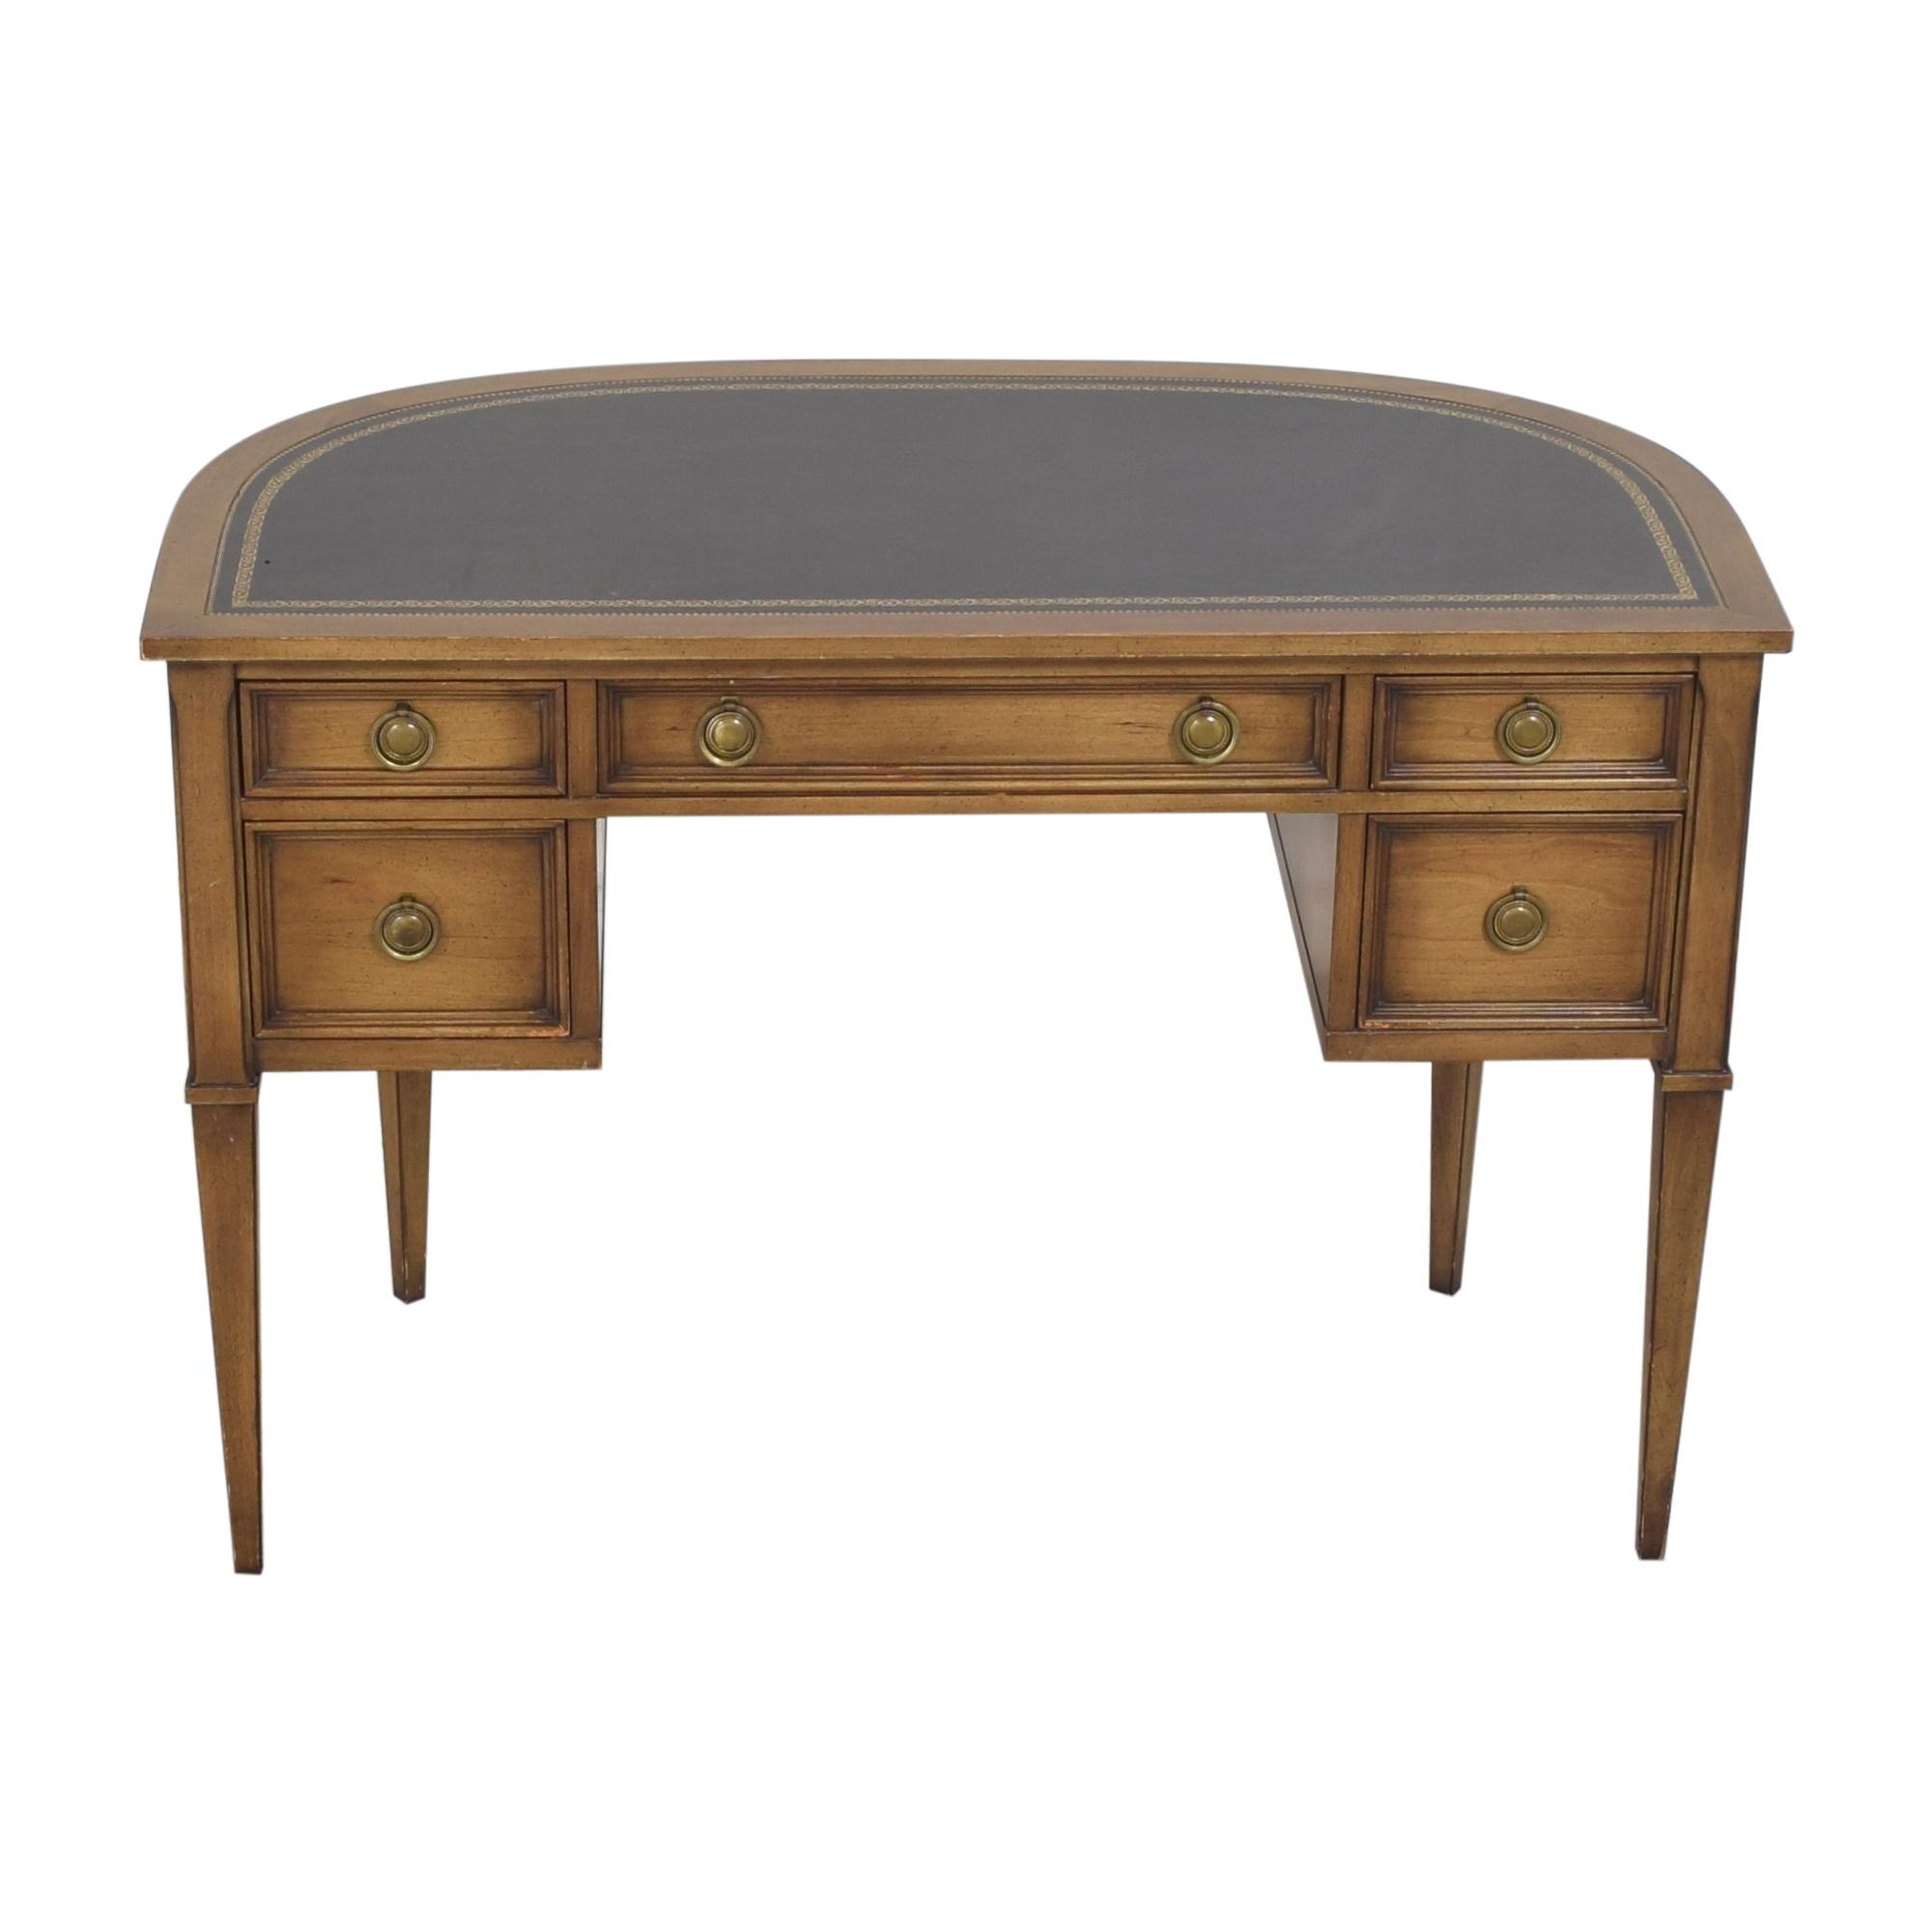 Sligh-Lowry Sligh-Lowry Vanity Desk ct